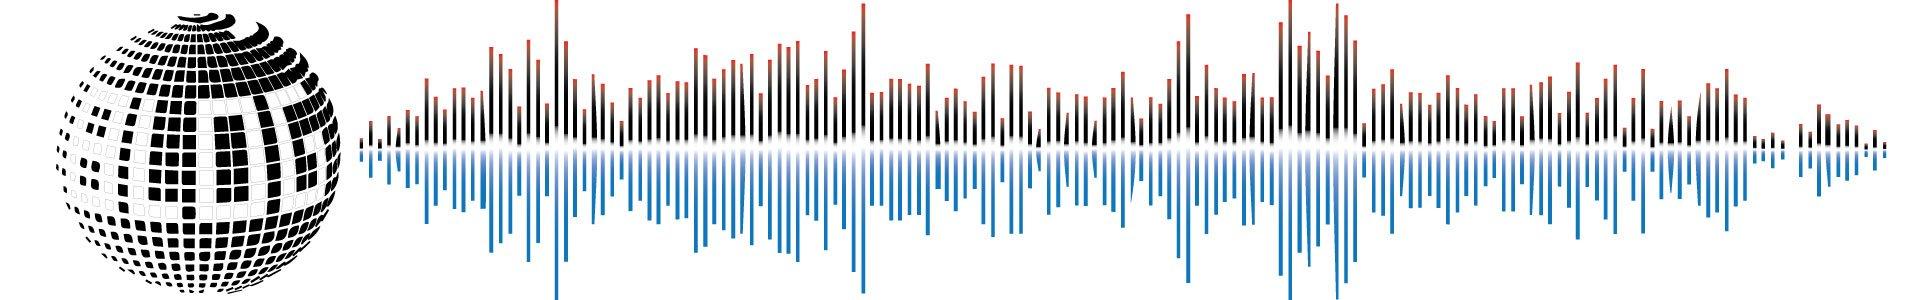 Numonix Interaction Recording Blog